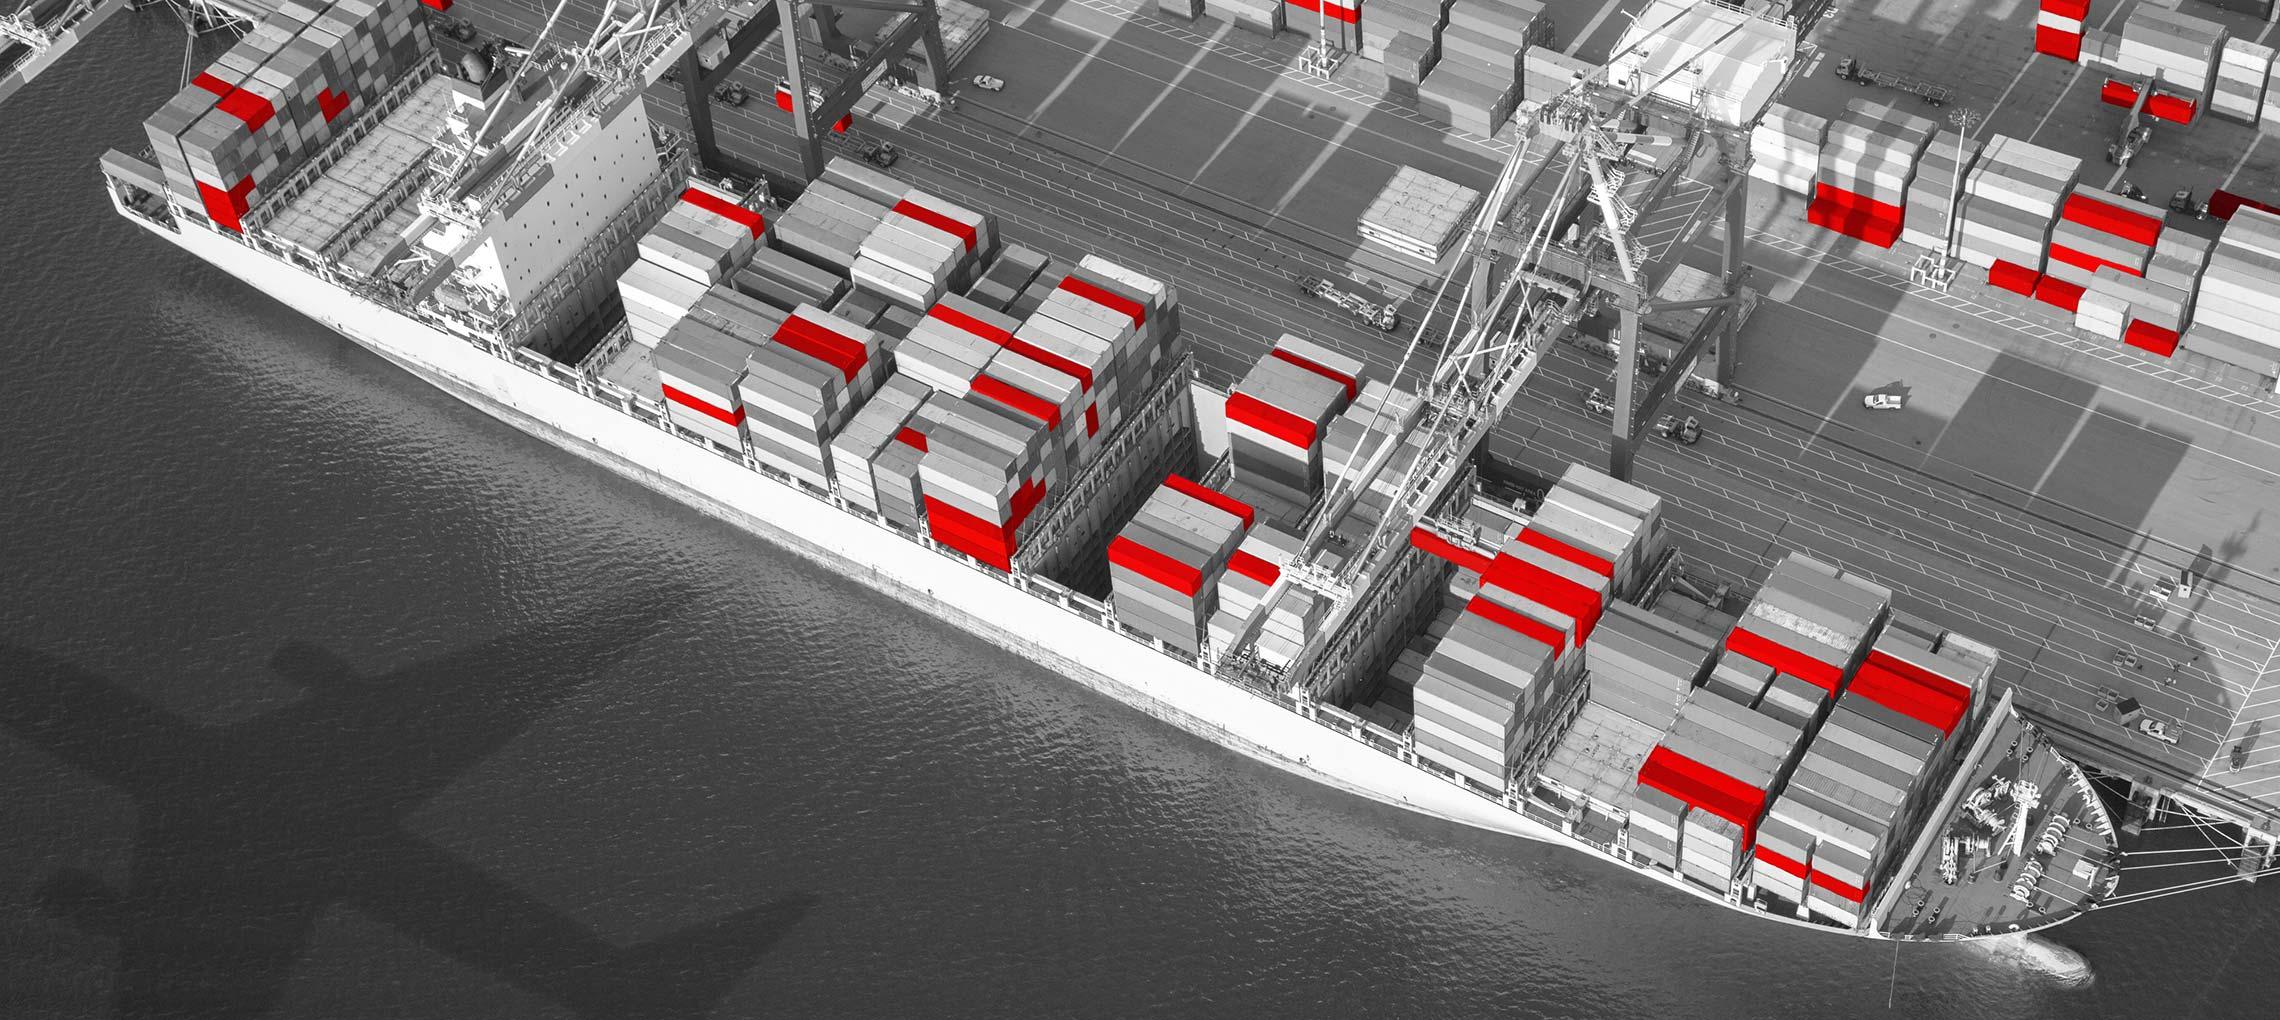 elia traders import and export uk 3 - Unique & Comprehensive worldwide import export service